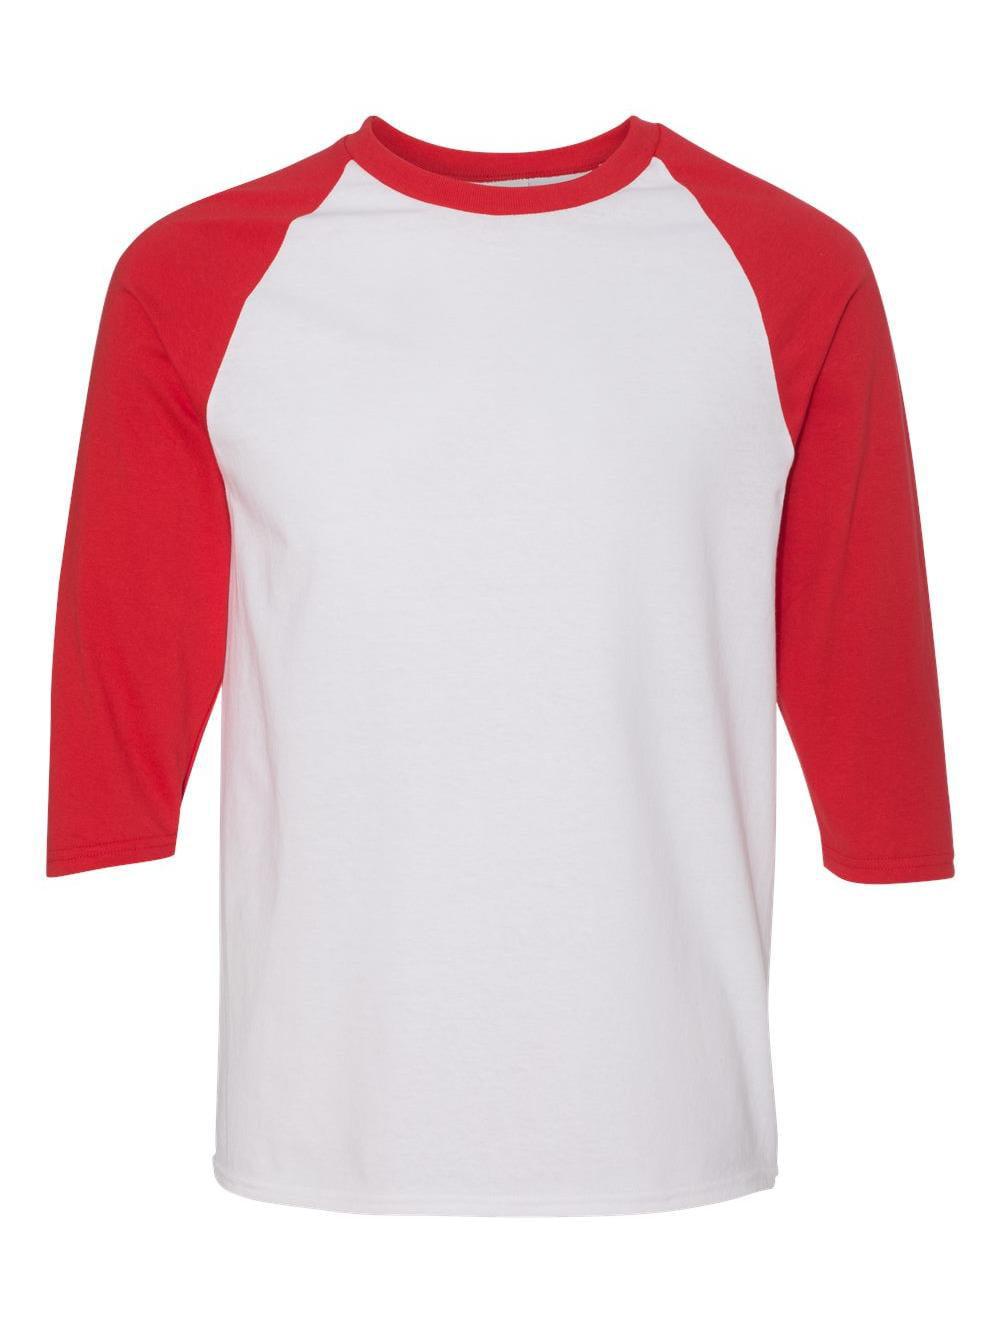 37cd844a Gildan - Heavy Cotton Three-Quarter Raglan Sleeve Baseball T-Shirt - 5700